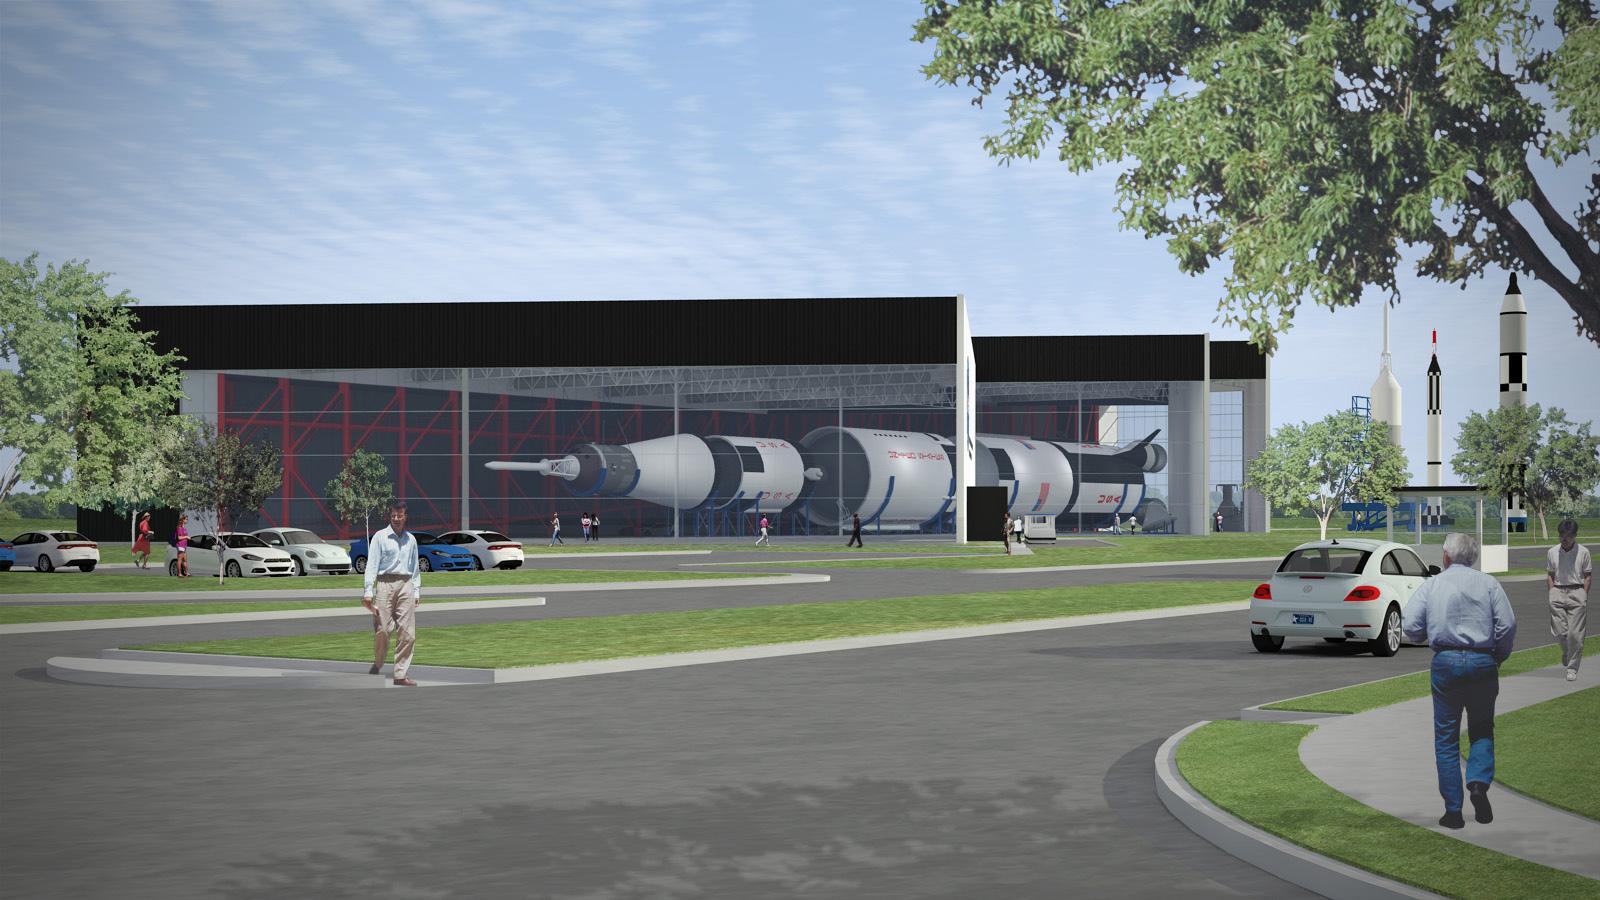 Rocket Park Houston Houston's Saturn v Rocket